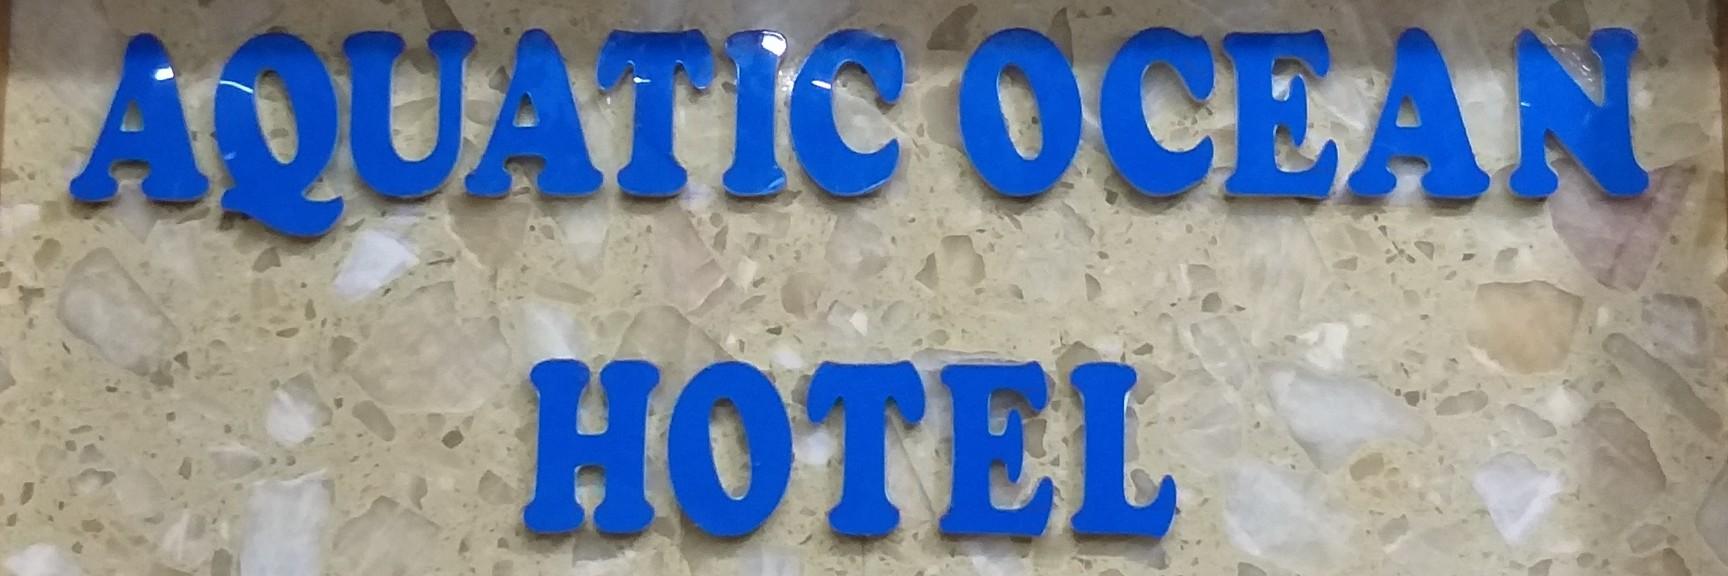 Aquatic Ocean Hotel